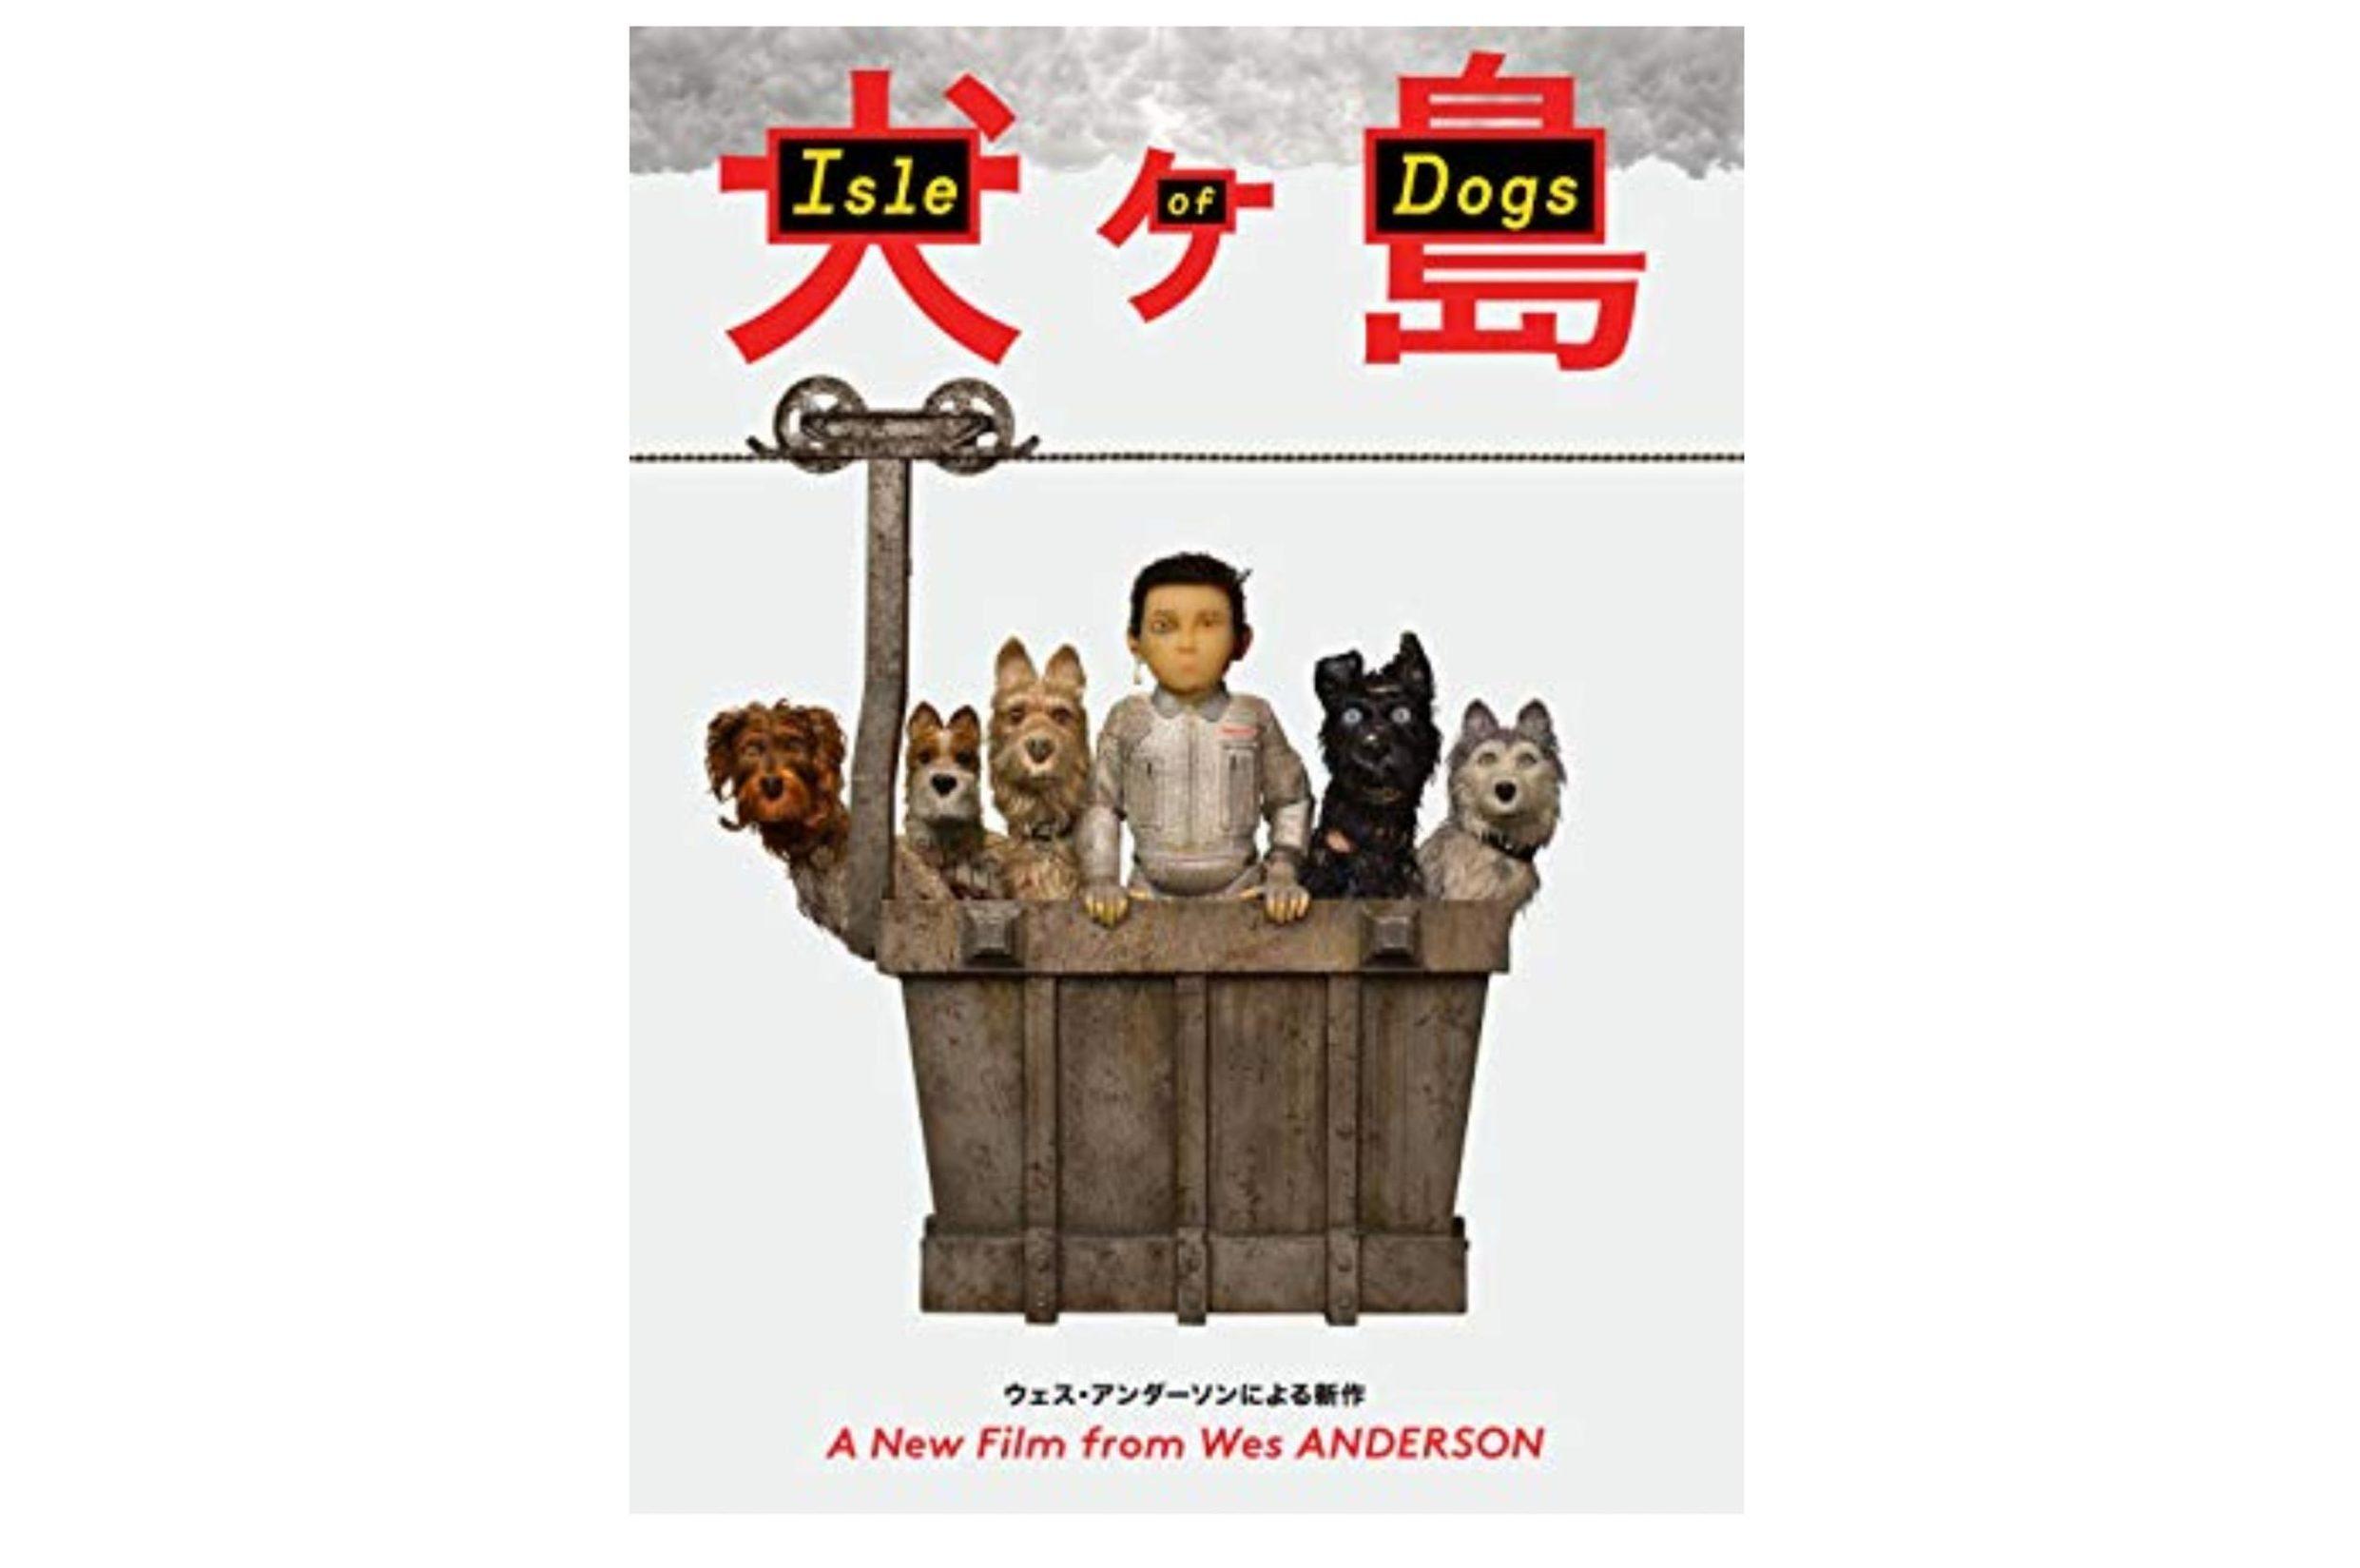 13_Isle-of-Dogs